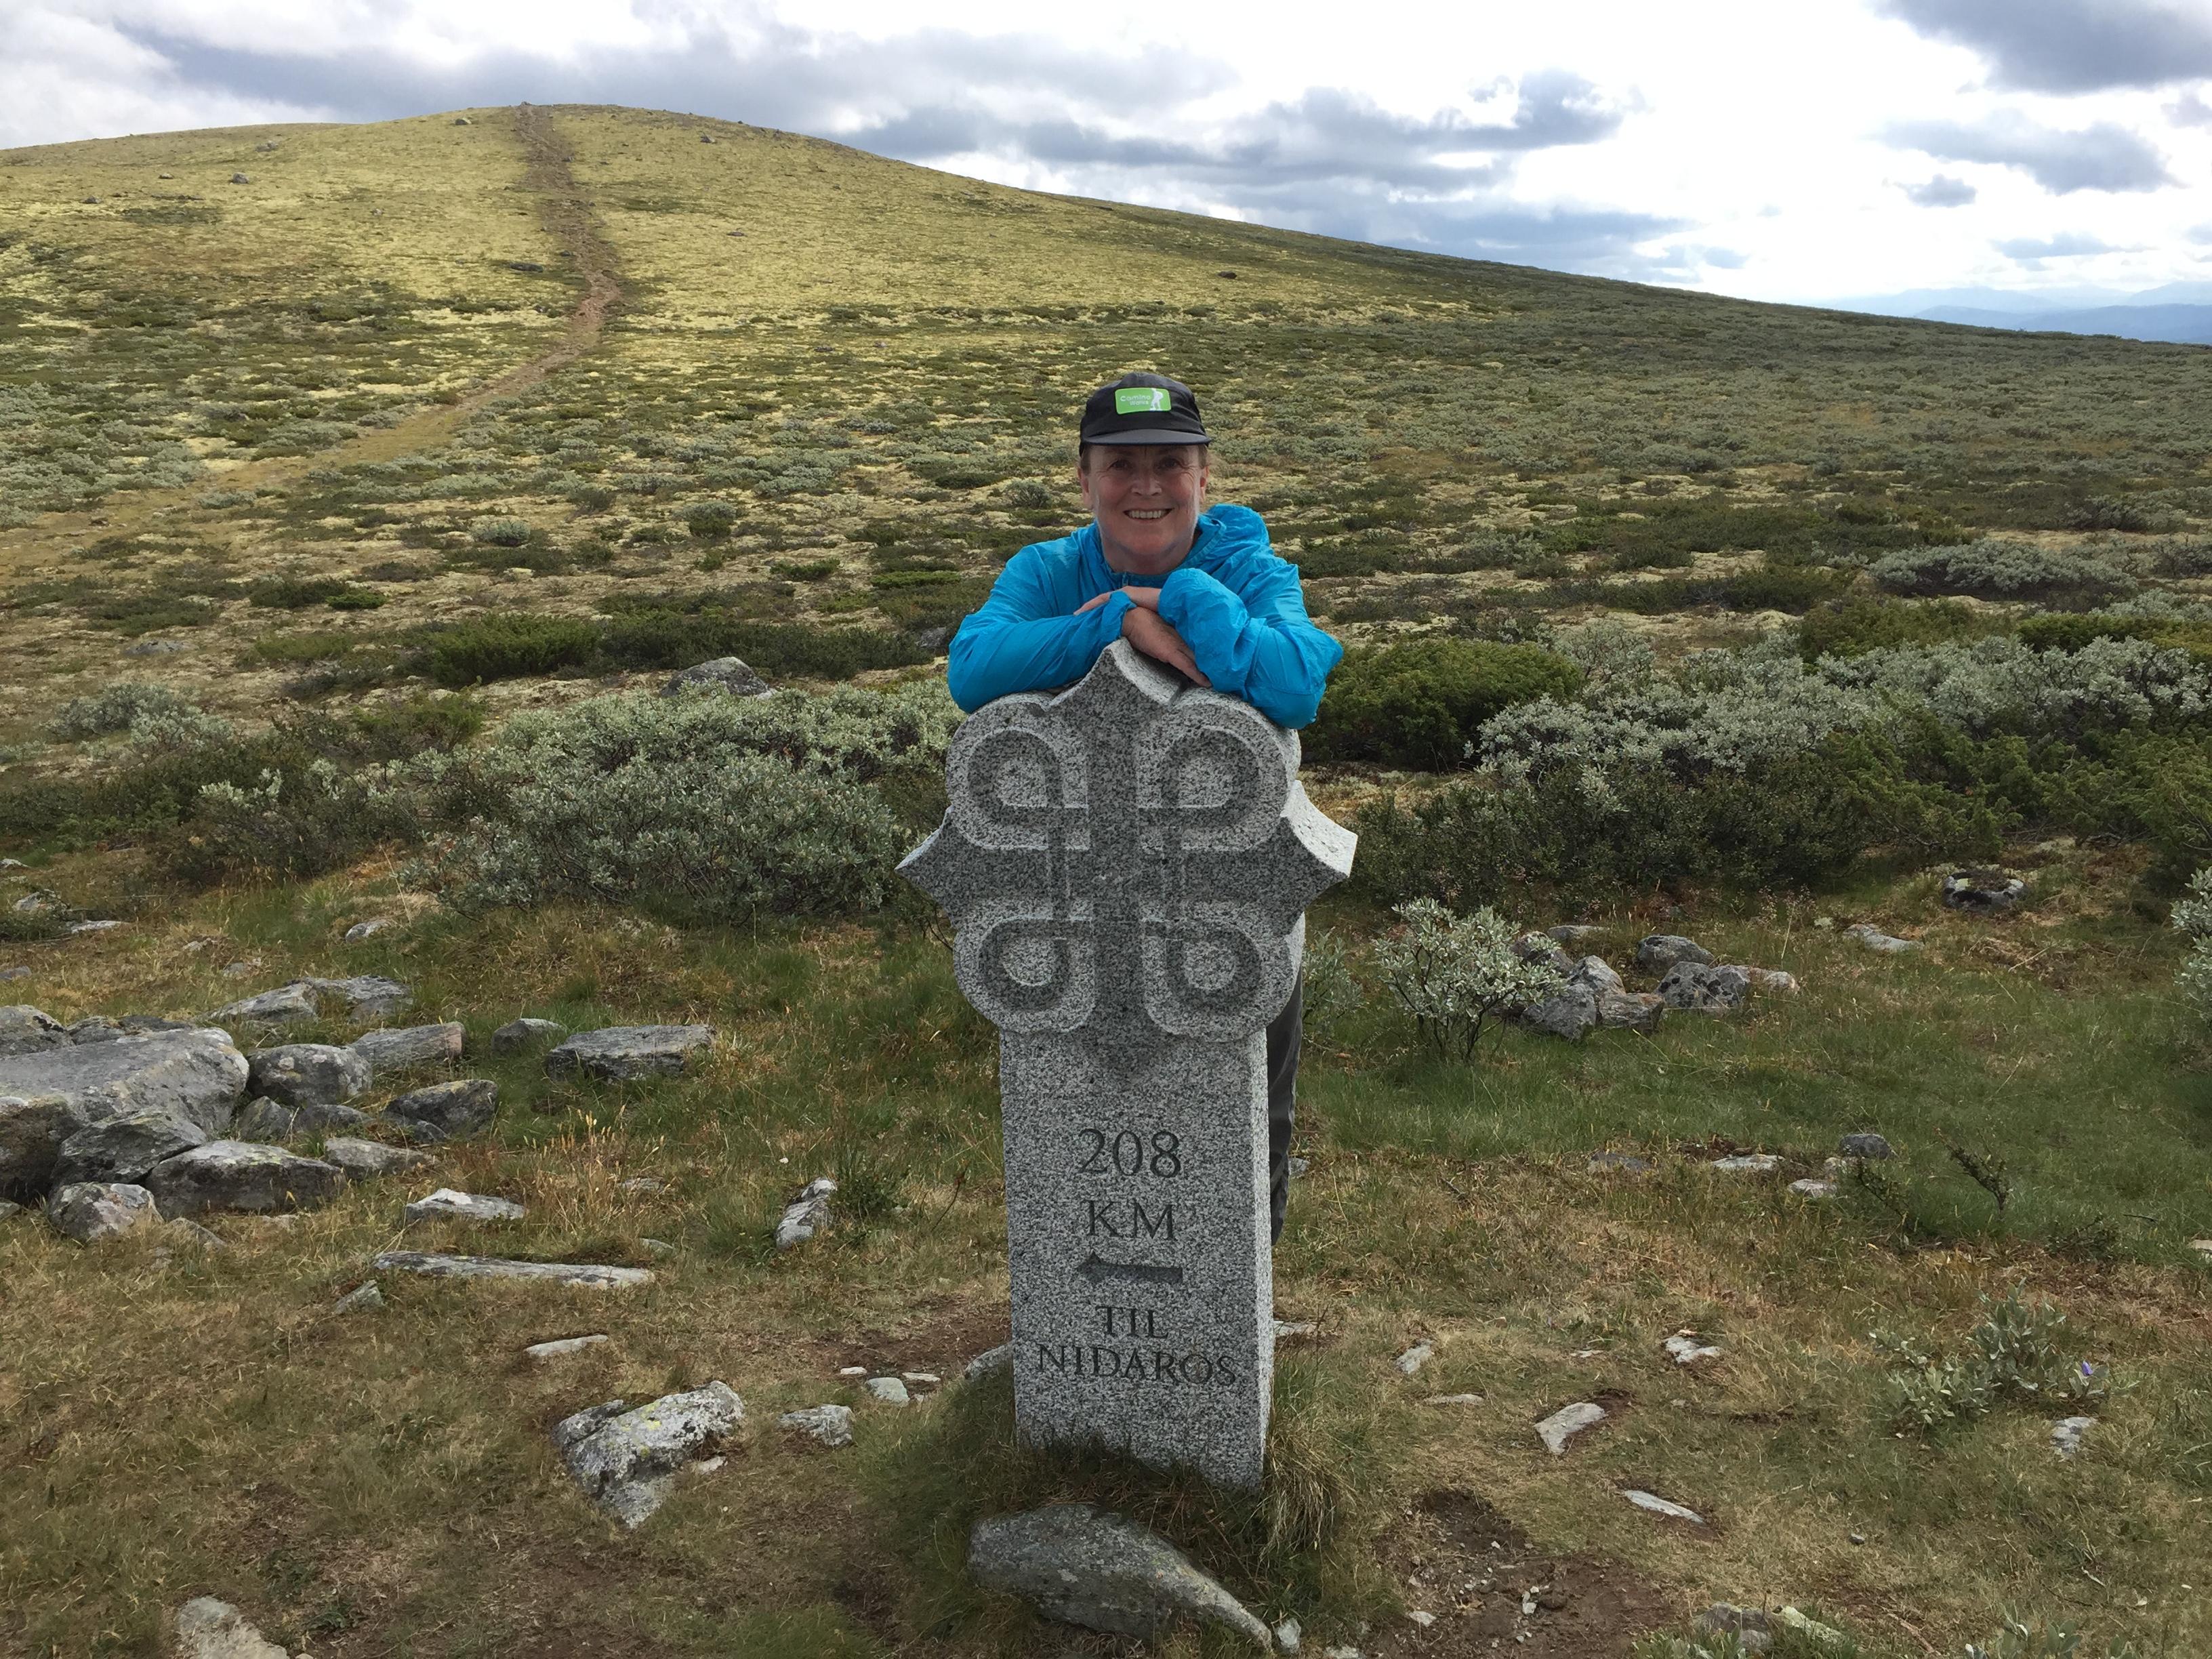 208 km igjen til Trondheim